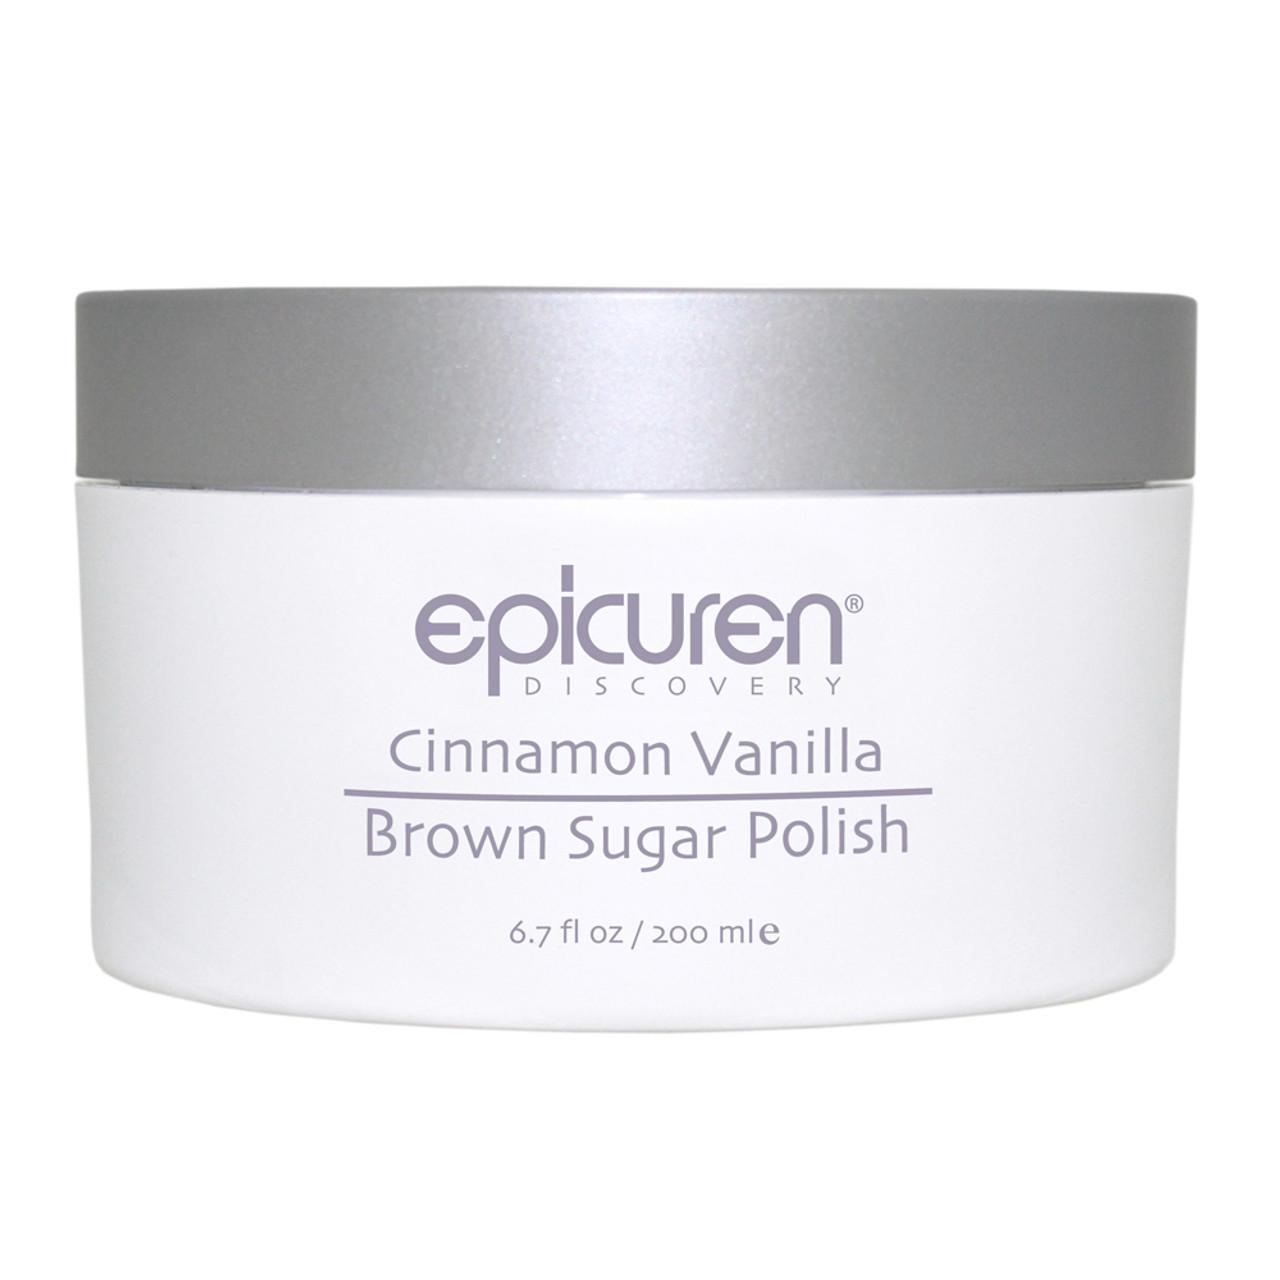 epicuren Discovery Cinnamon Vanilla Brown Sugar Body Polish